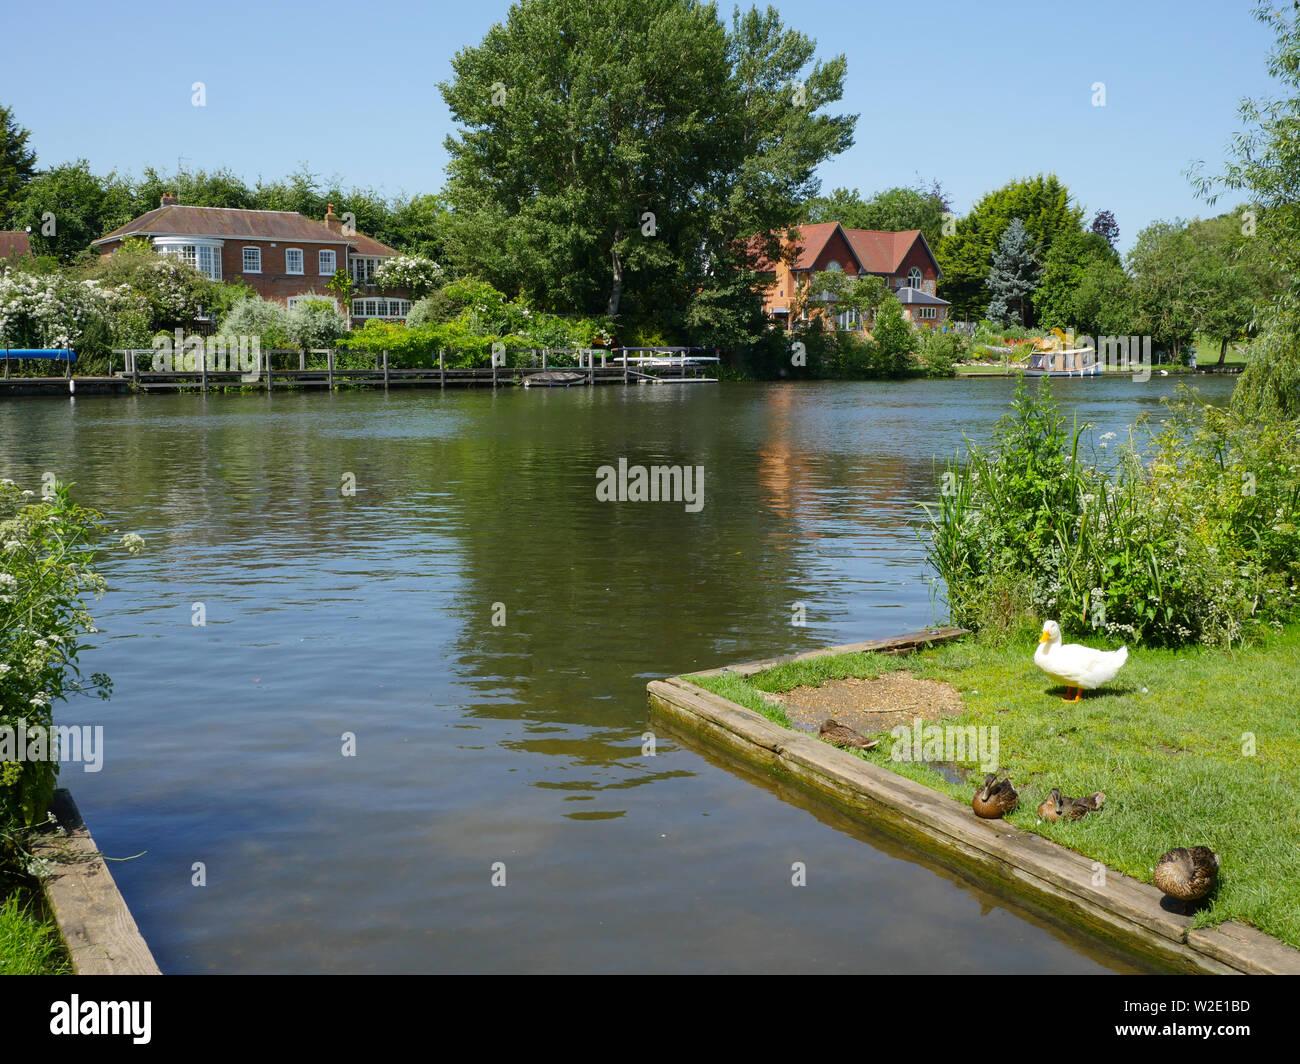 River Thames Landscape, at Ferry Lane, on The Ridgeway Path, South Stoke, Oxfordshire, England, UK, GB. Stock Photo